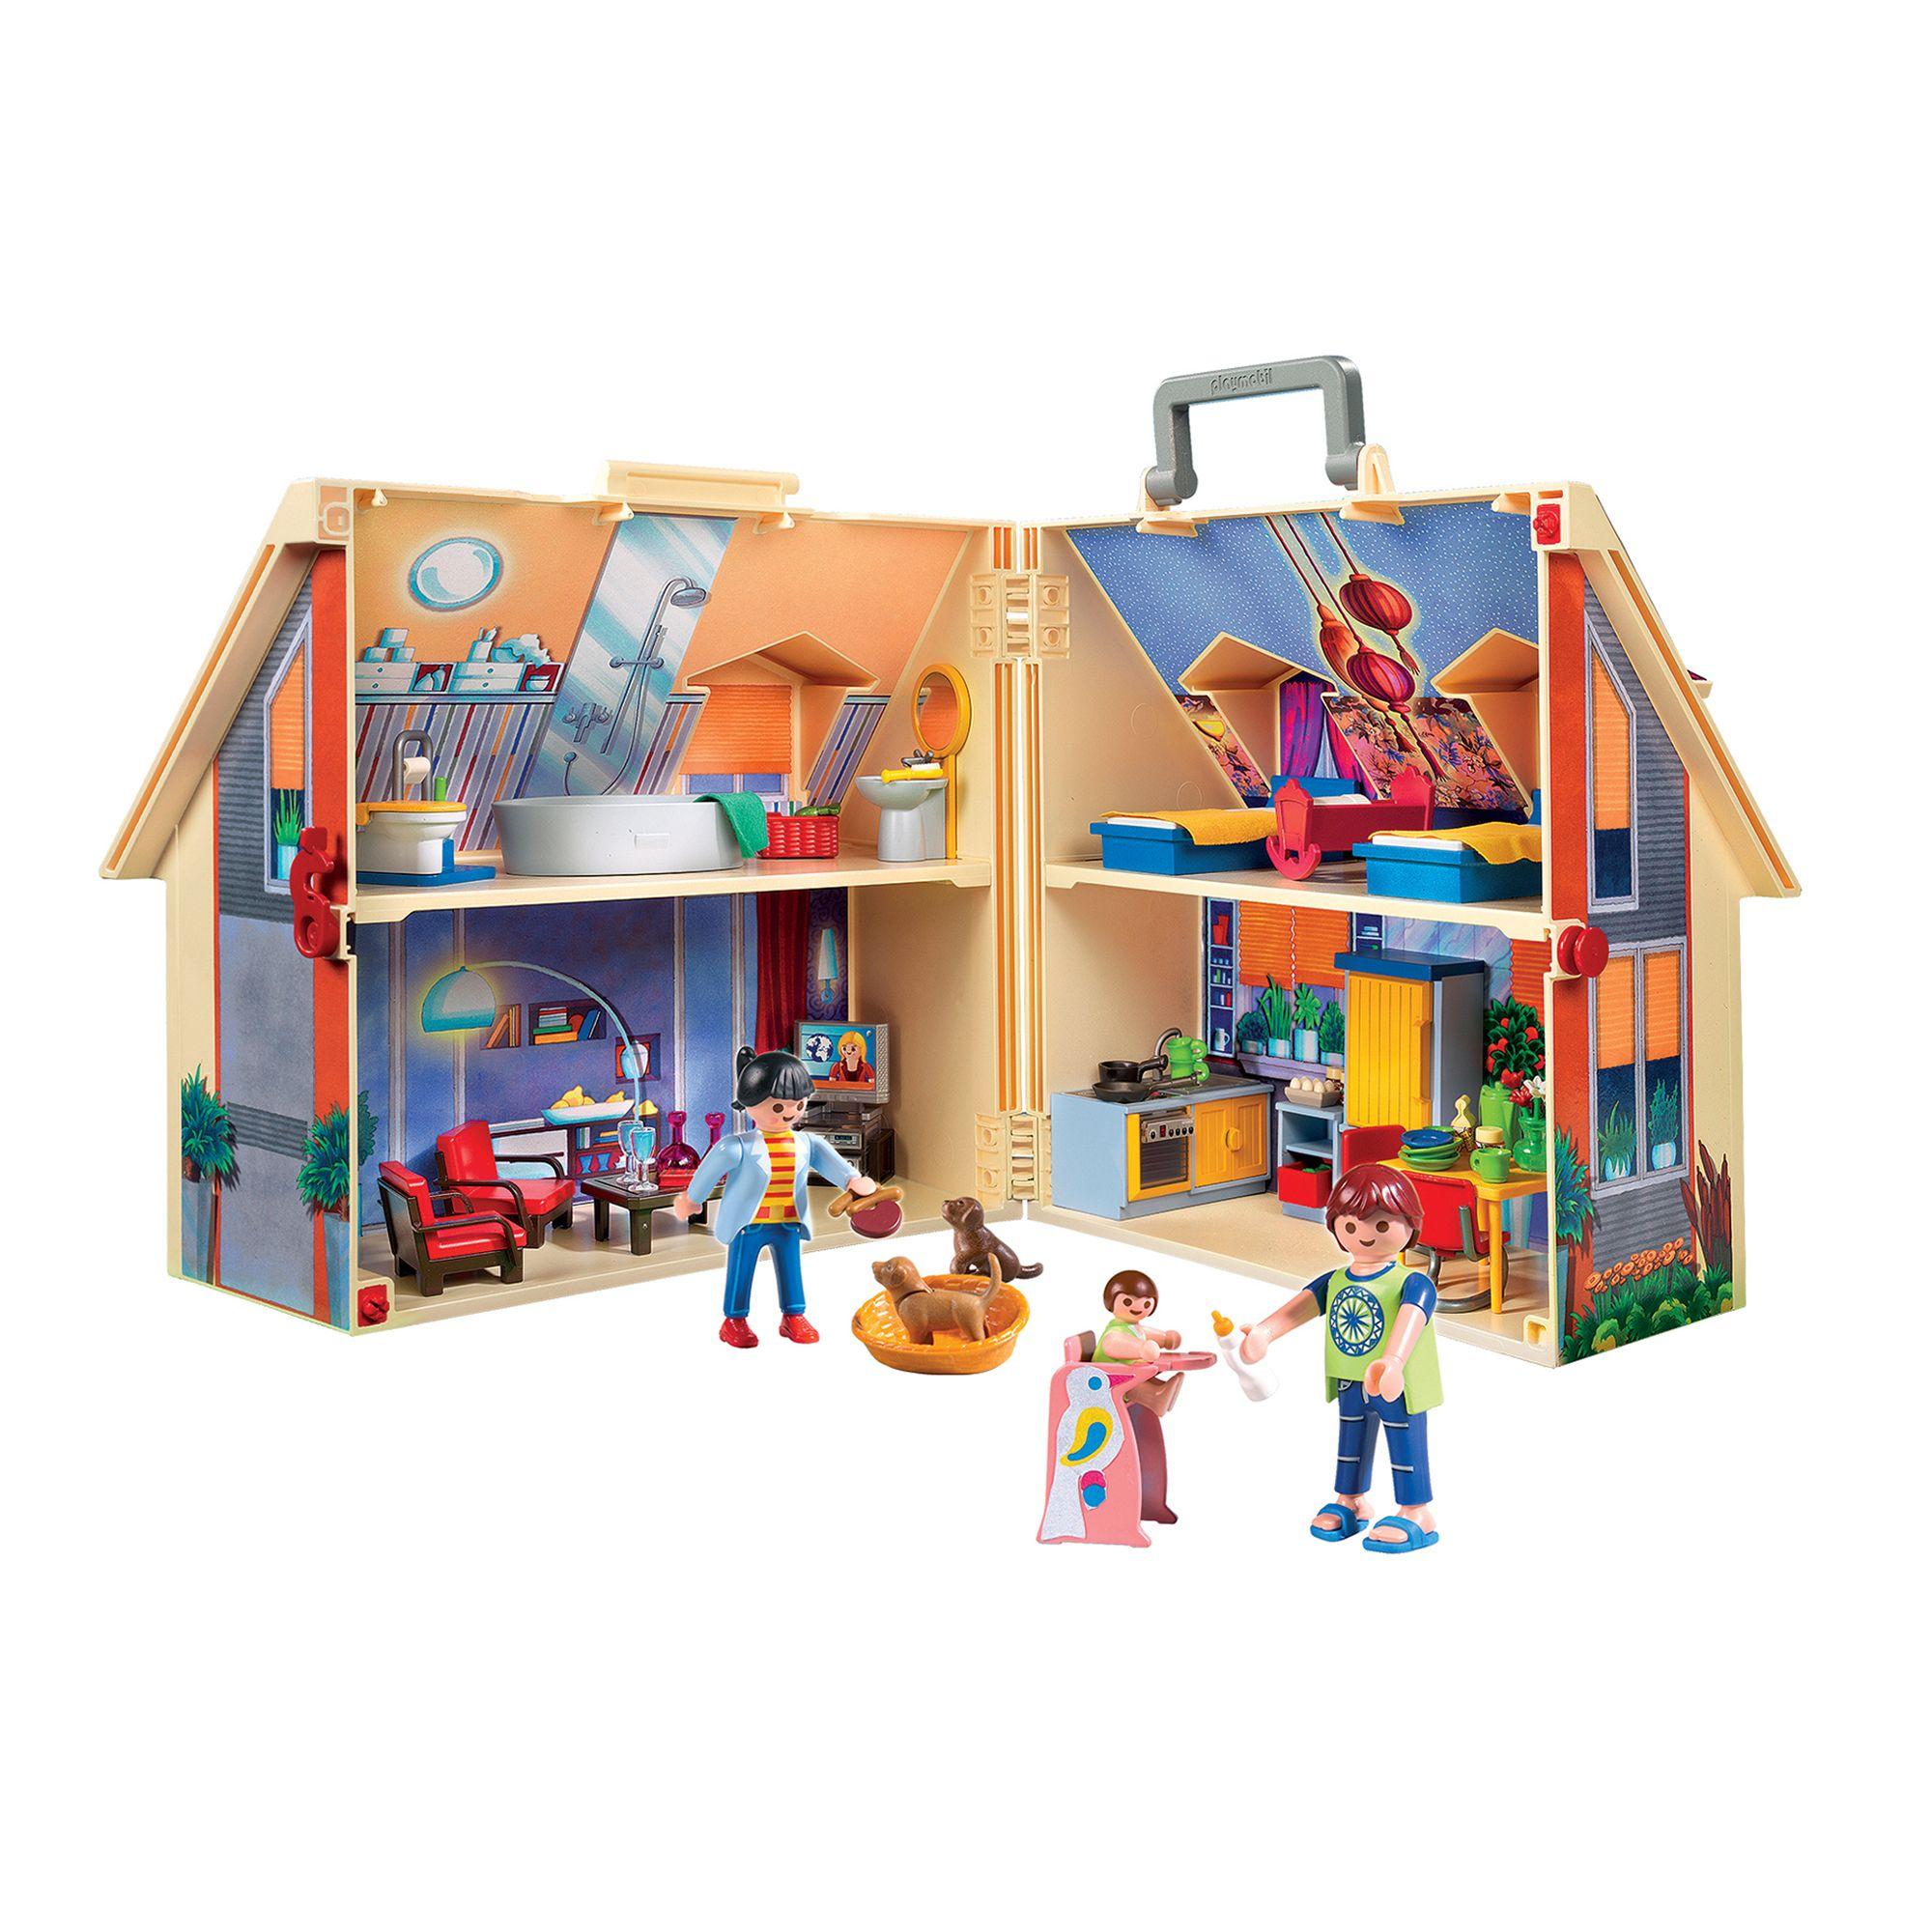 Playmobil Take Along Farm Playmobil® Take Along Modern